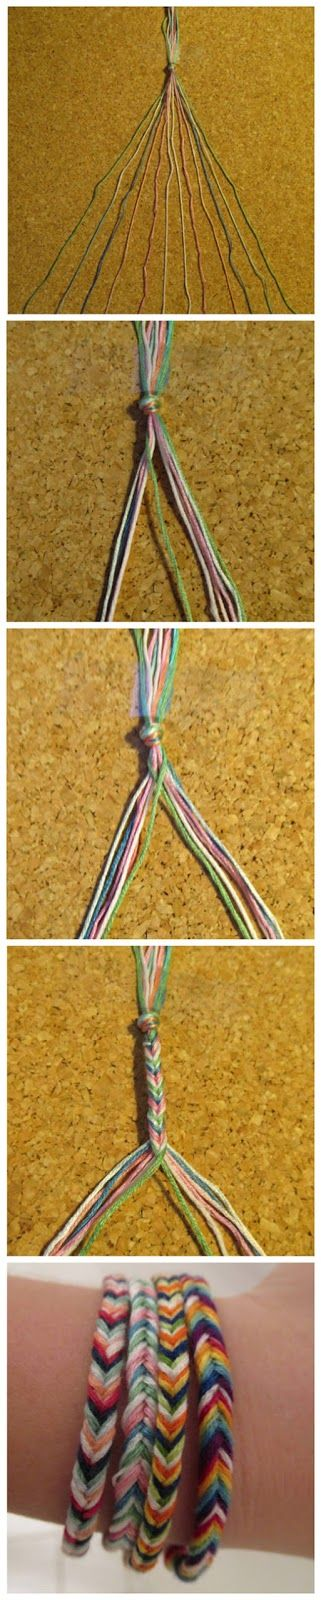 joybobo: A Fishtail Friendship Bracelet